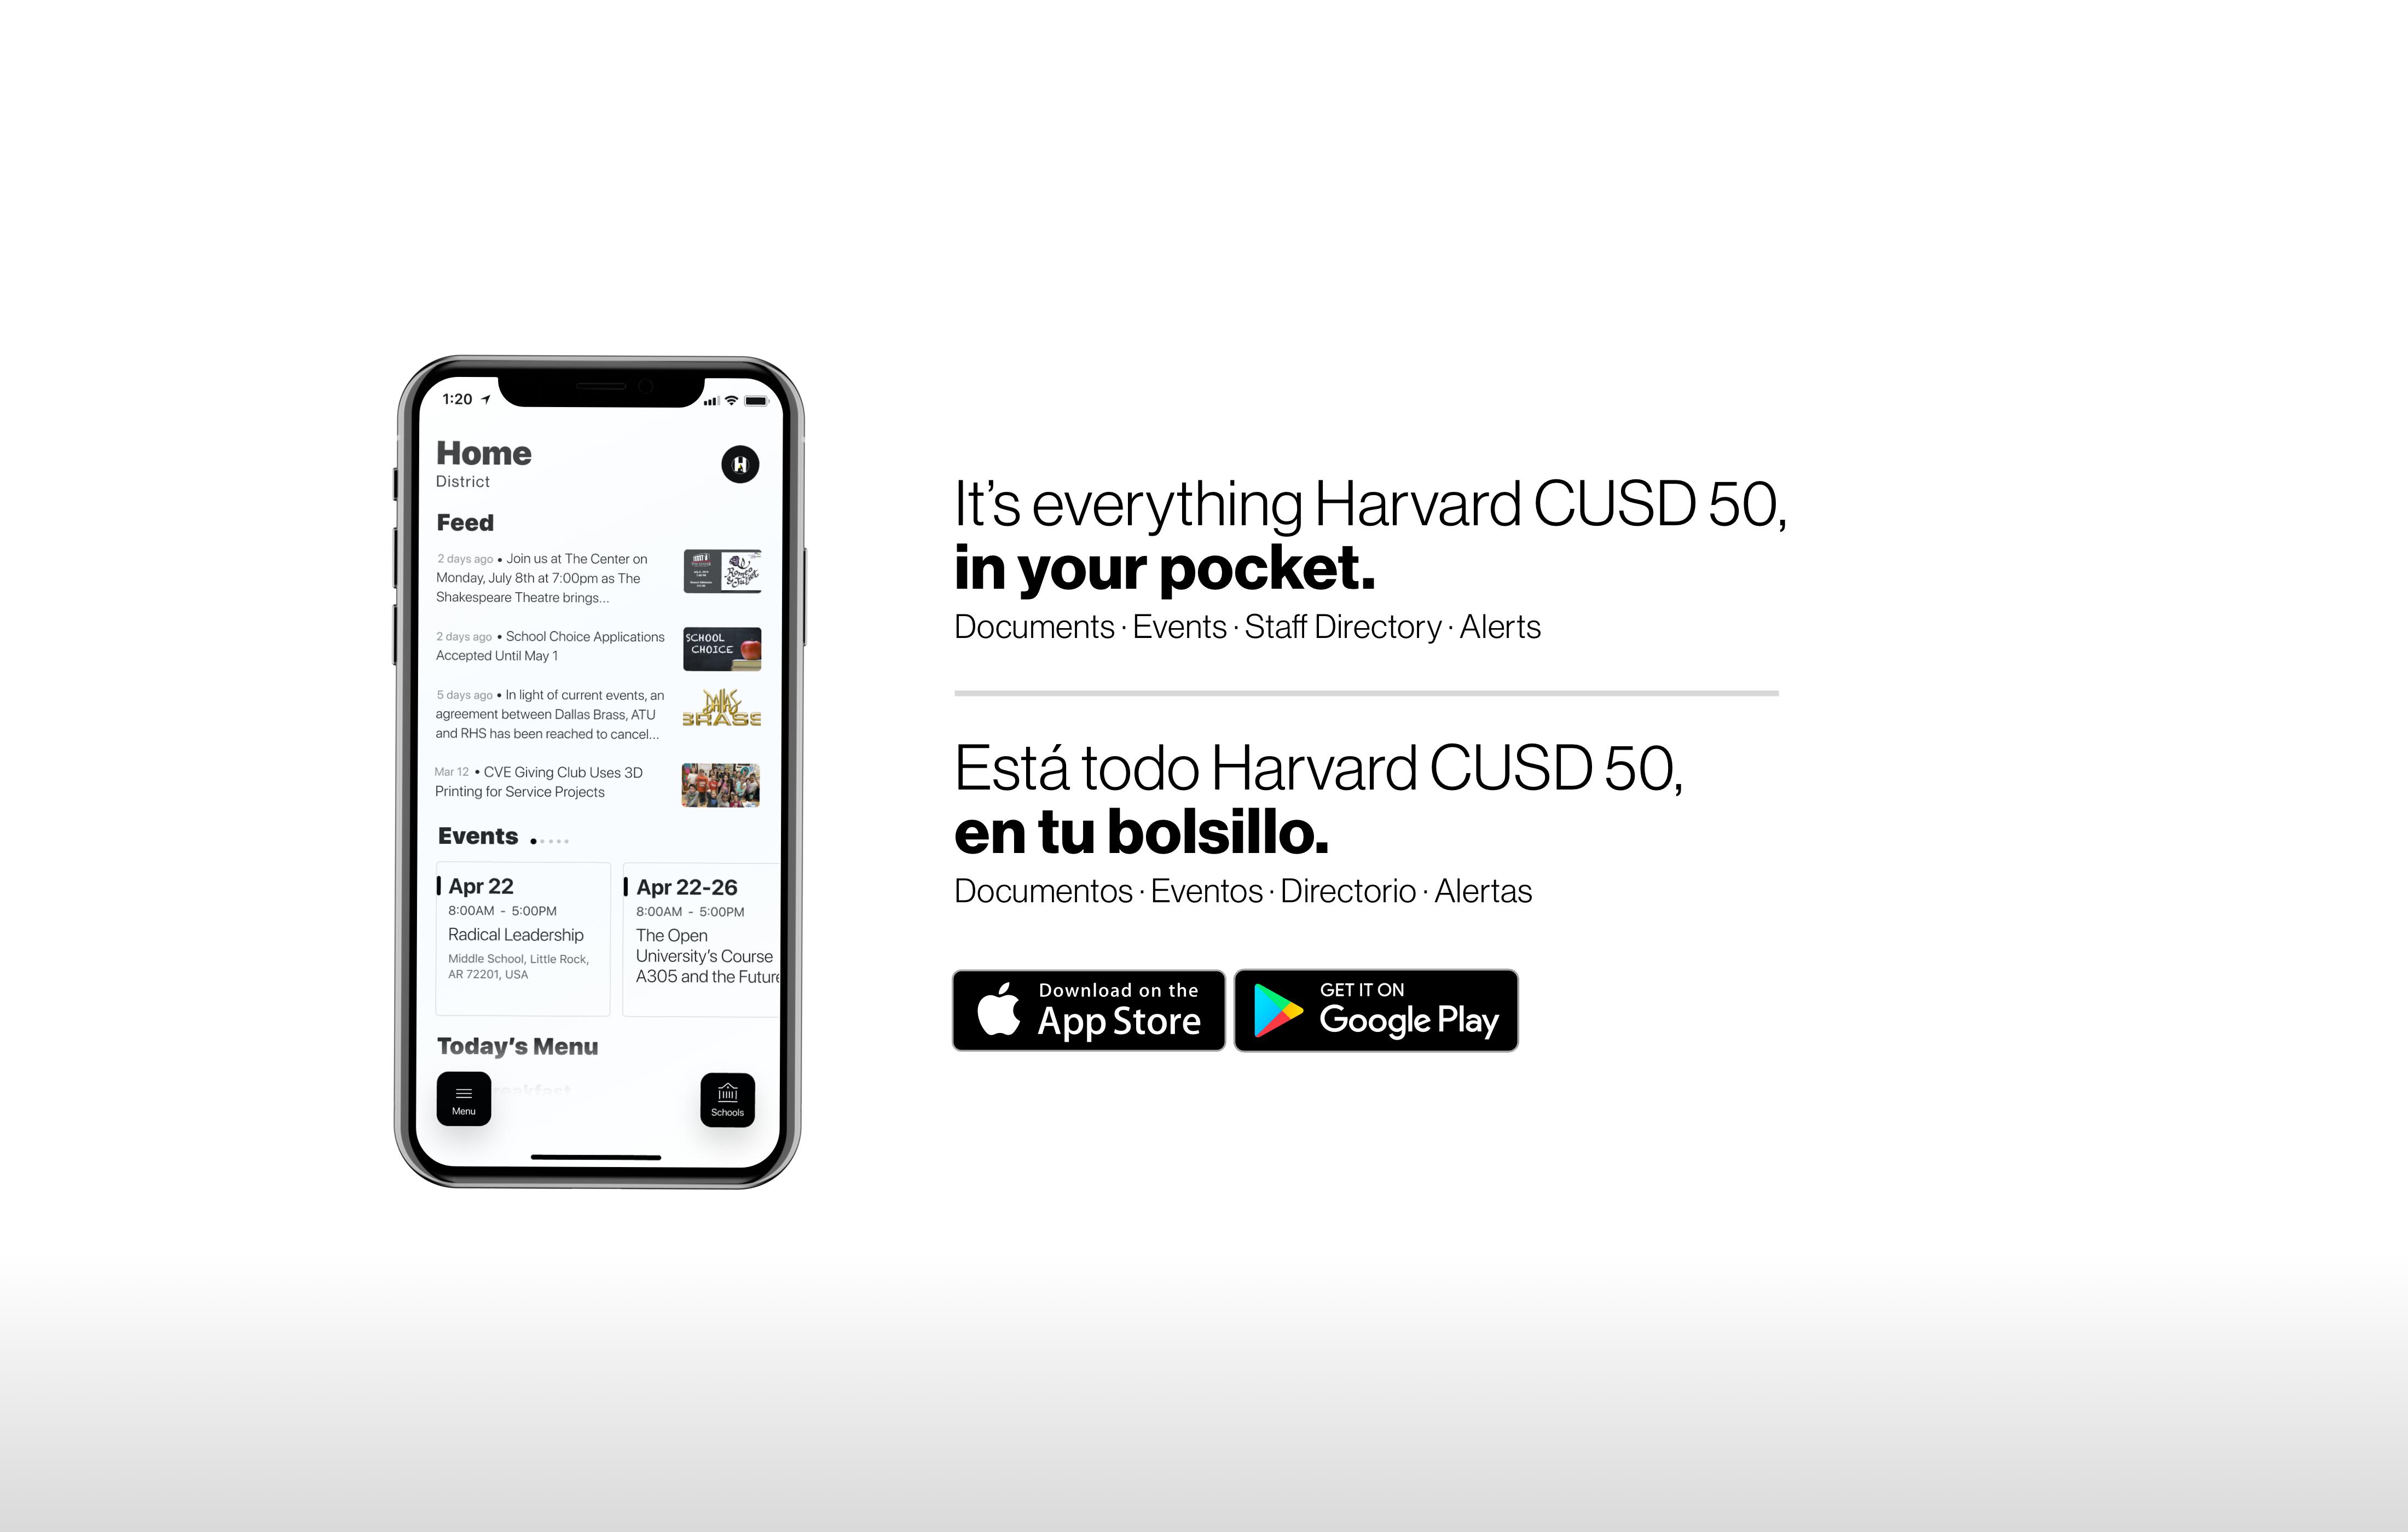 We have a new app, Harvard CUSD 50